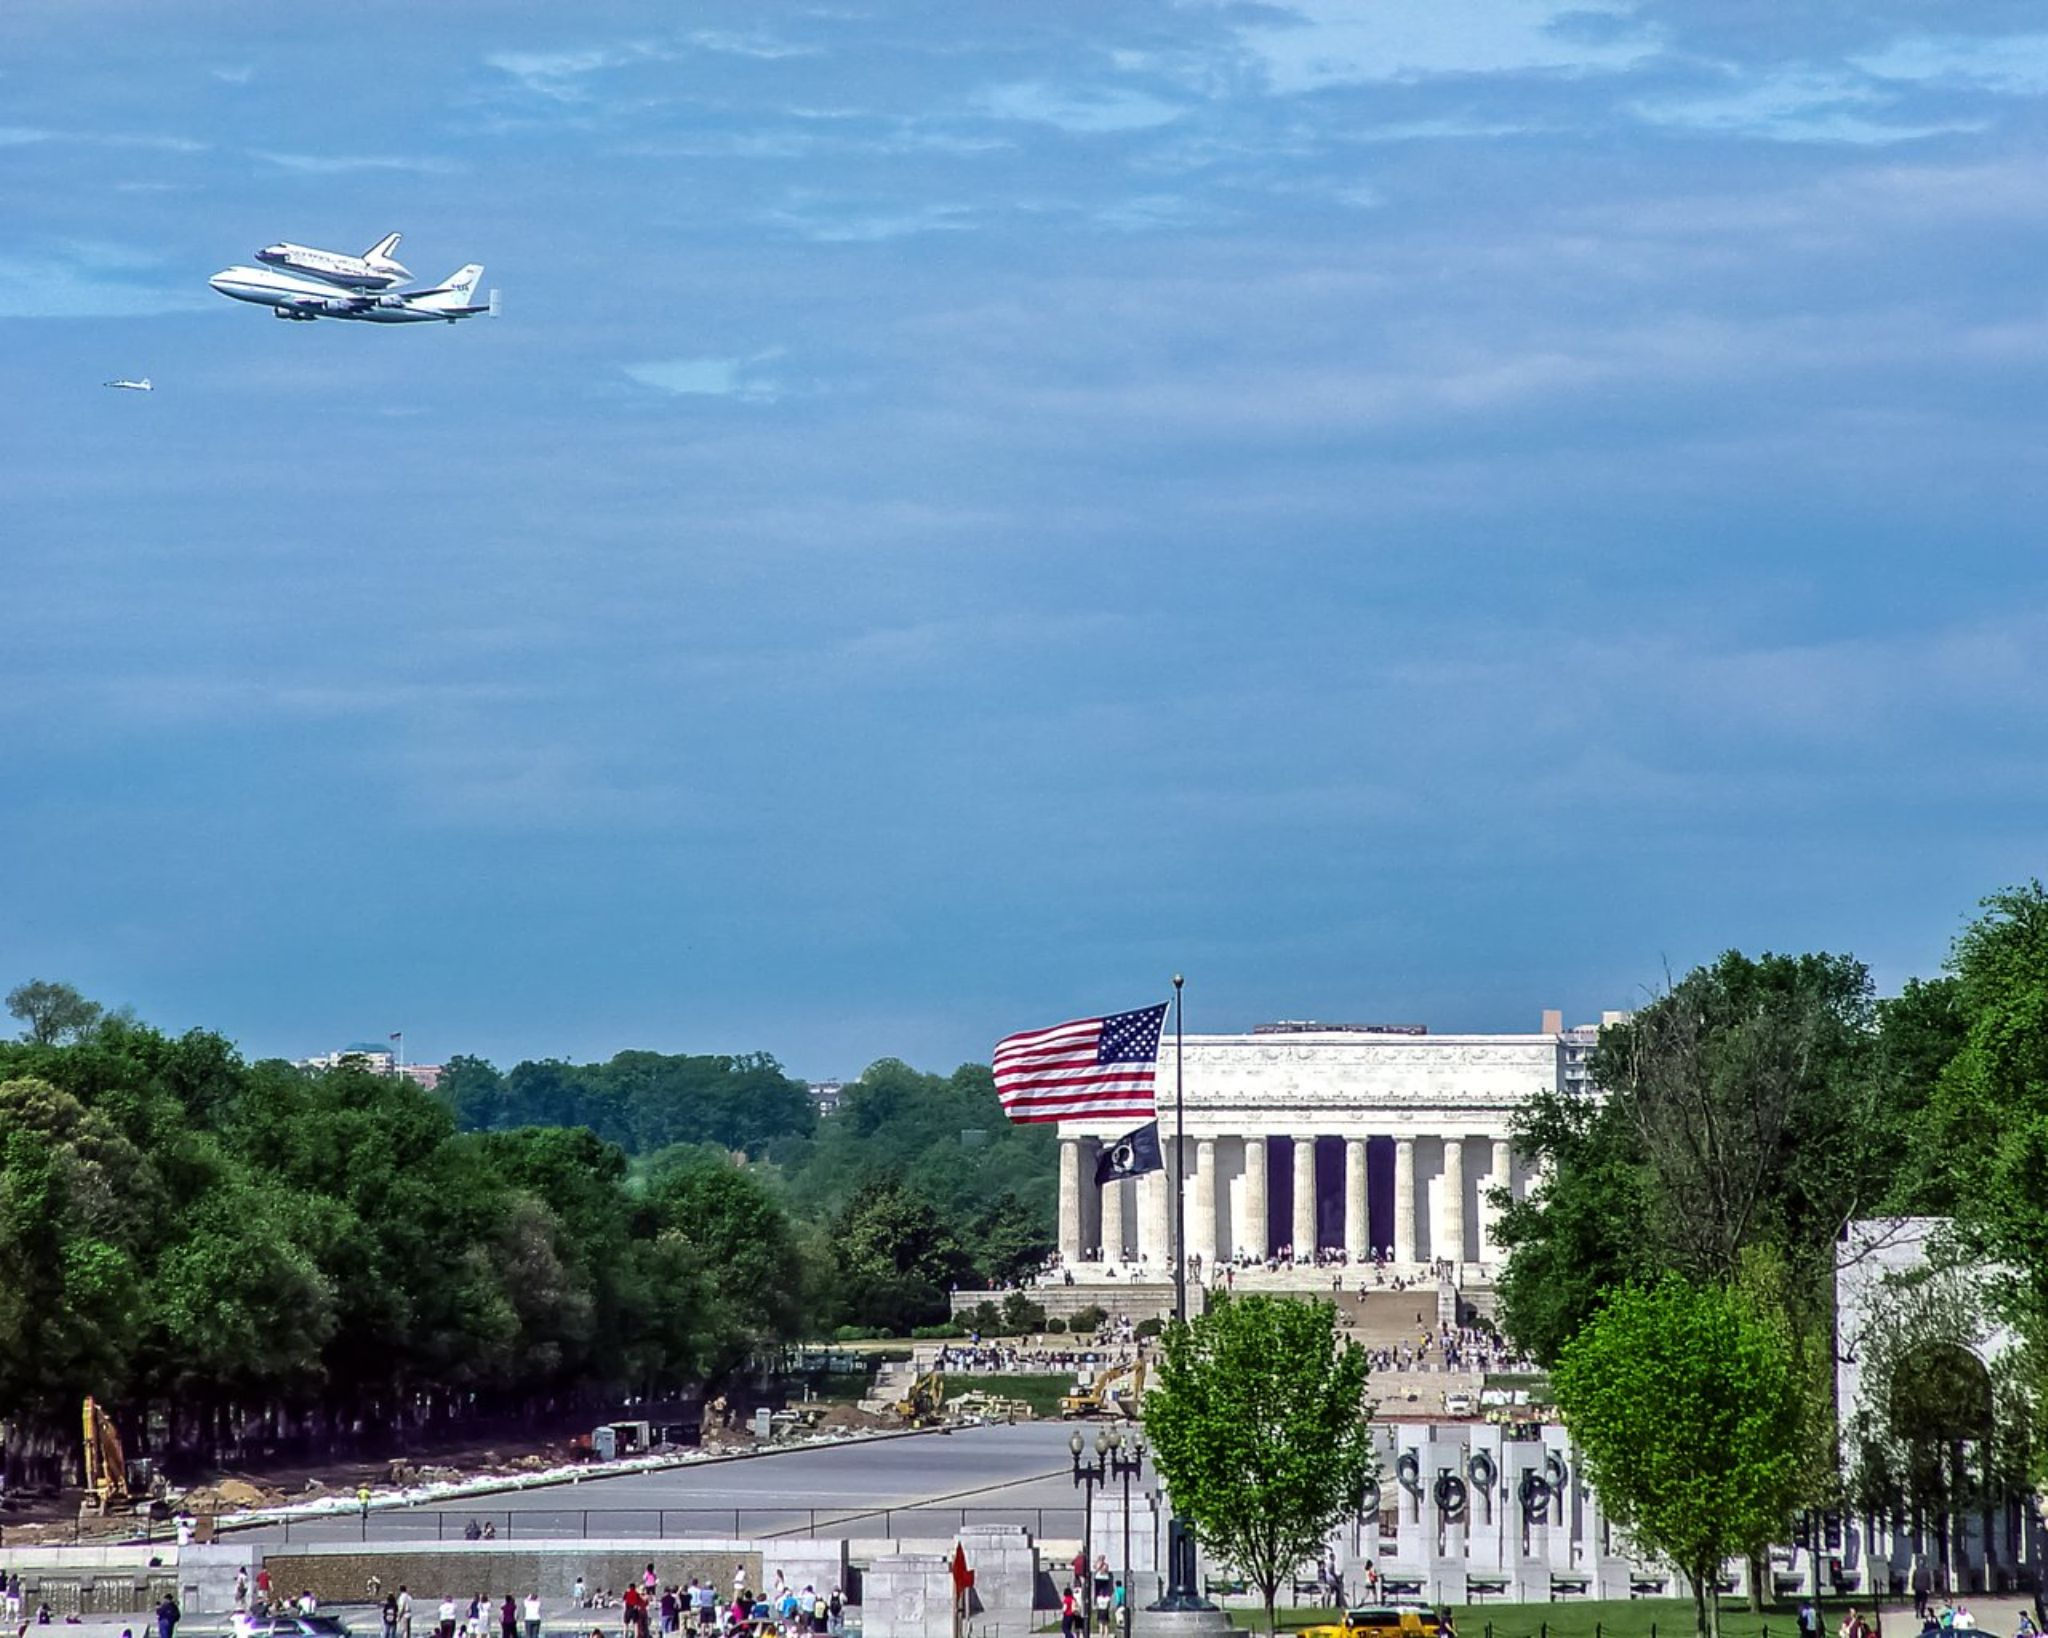 Space Shuttle Over Washington, DC by erikcoxphotography